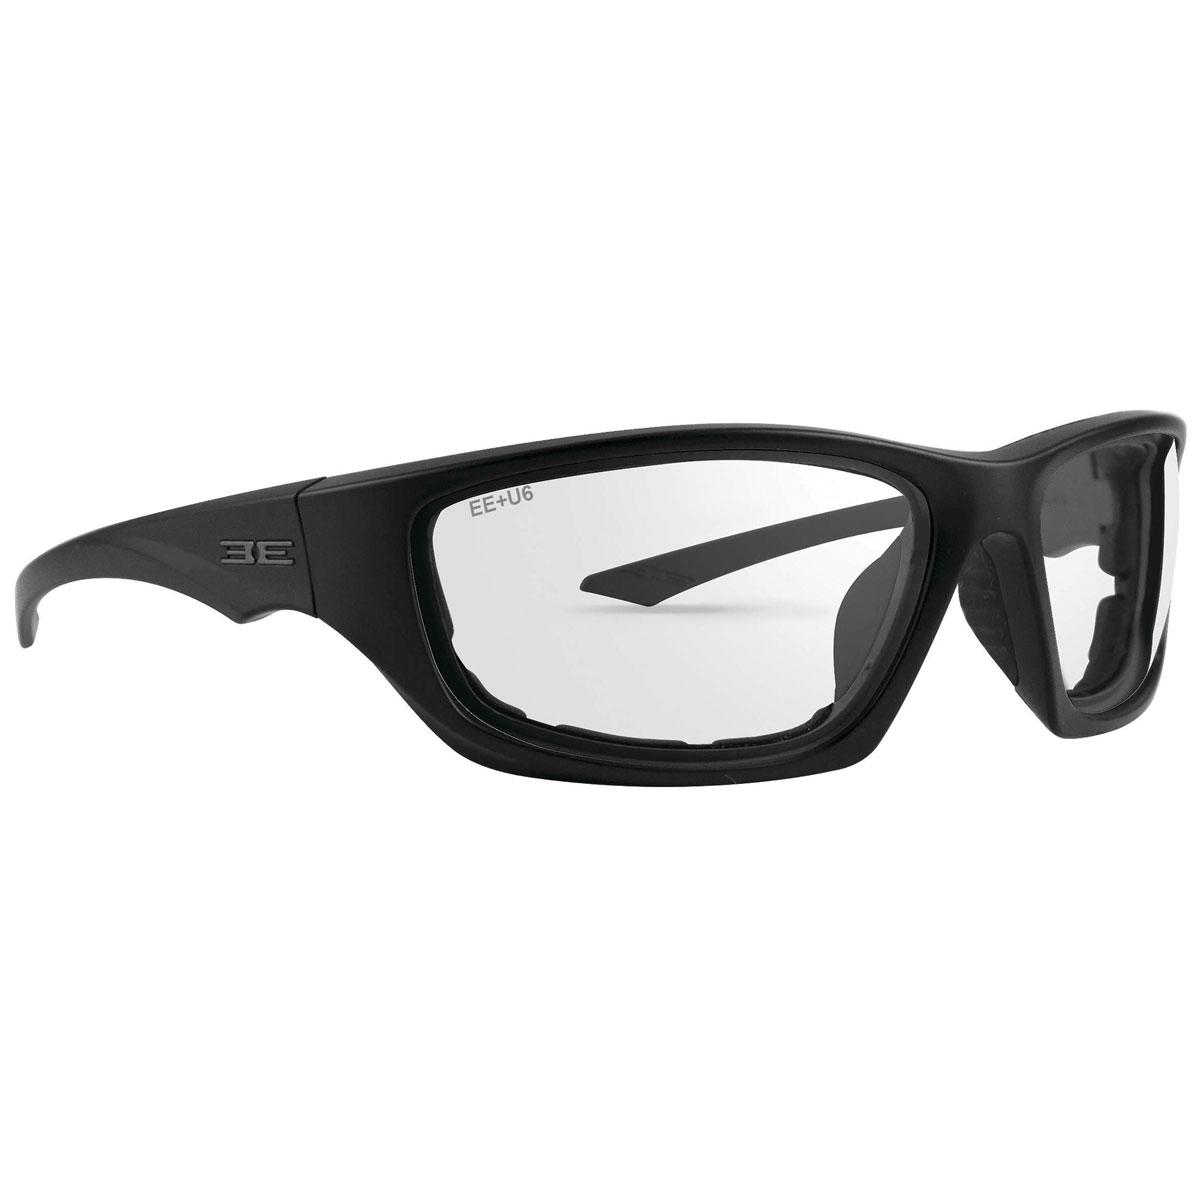 Epoch Eyewear Epoch Foam 3 Sunglasses with Clear Lens